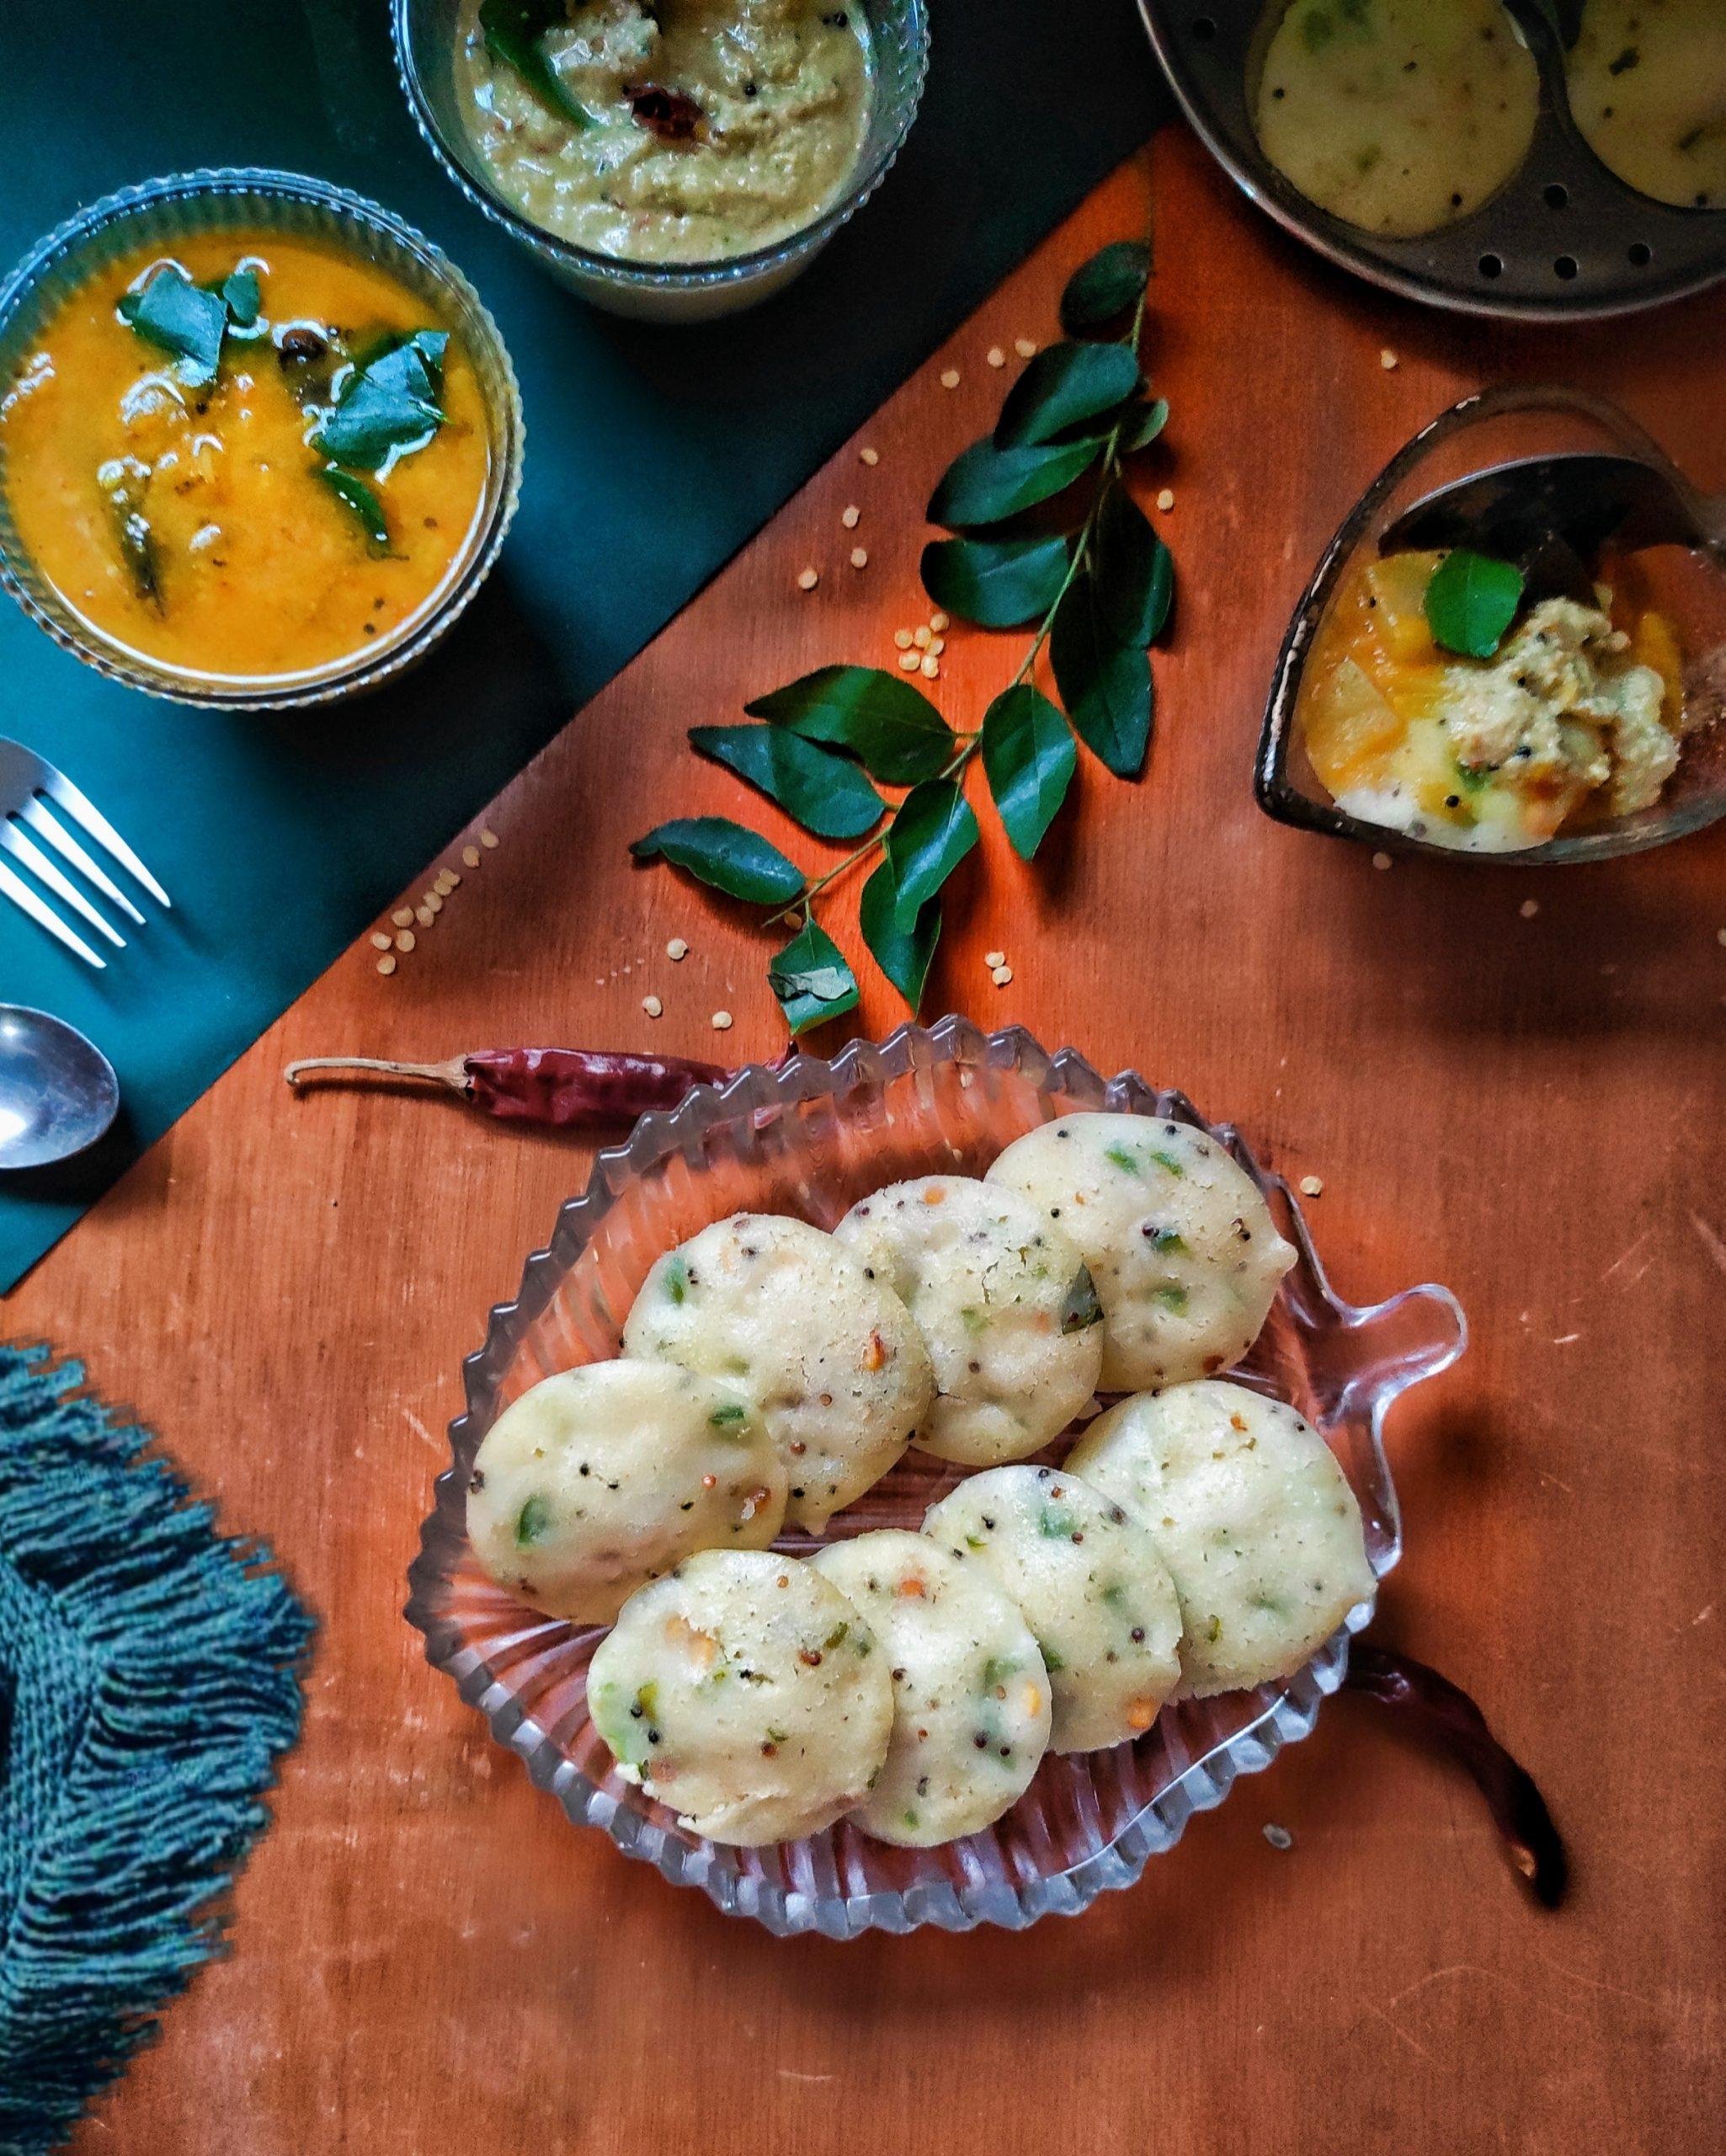 instant rava idli with sambhar and coconut chutney